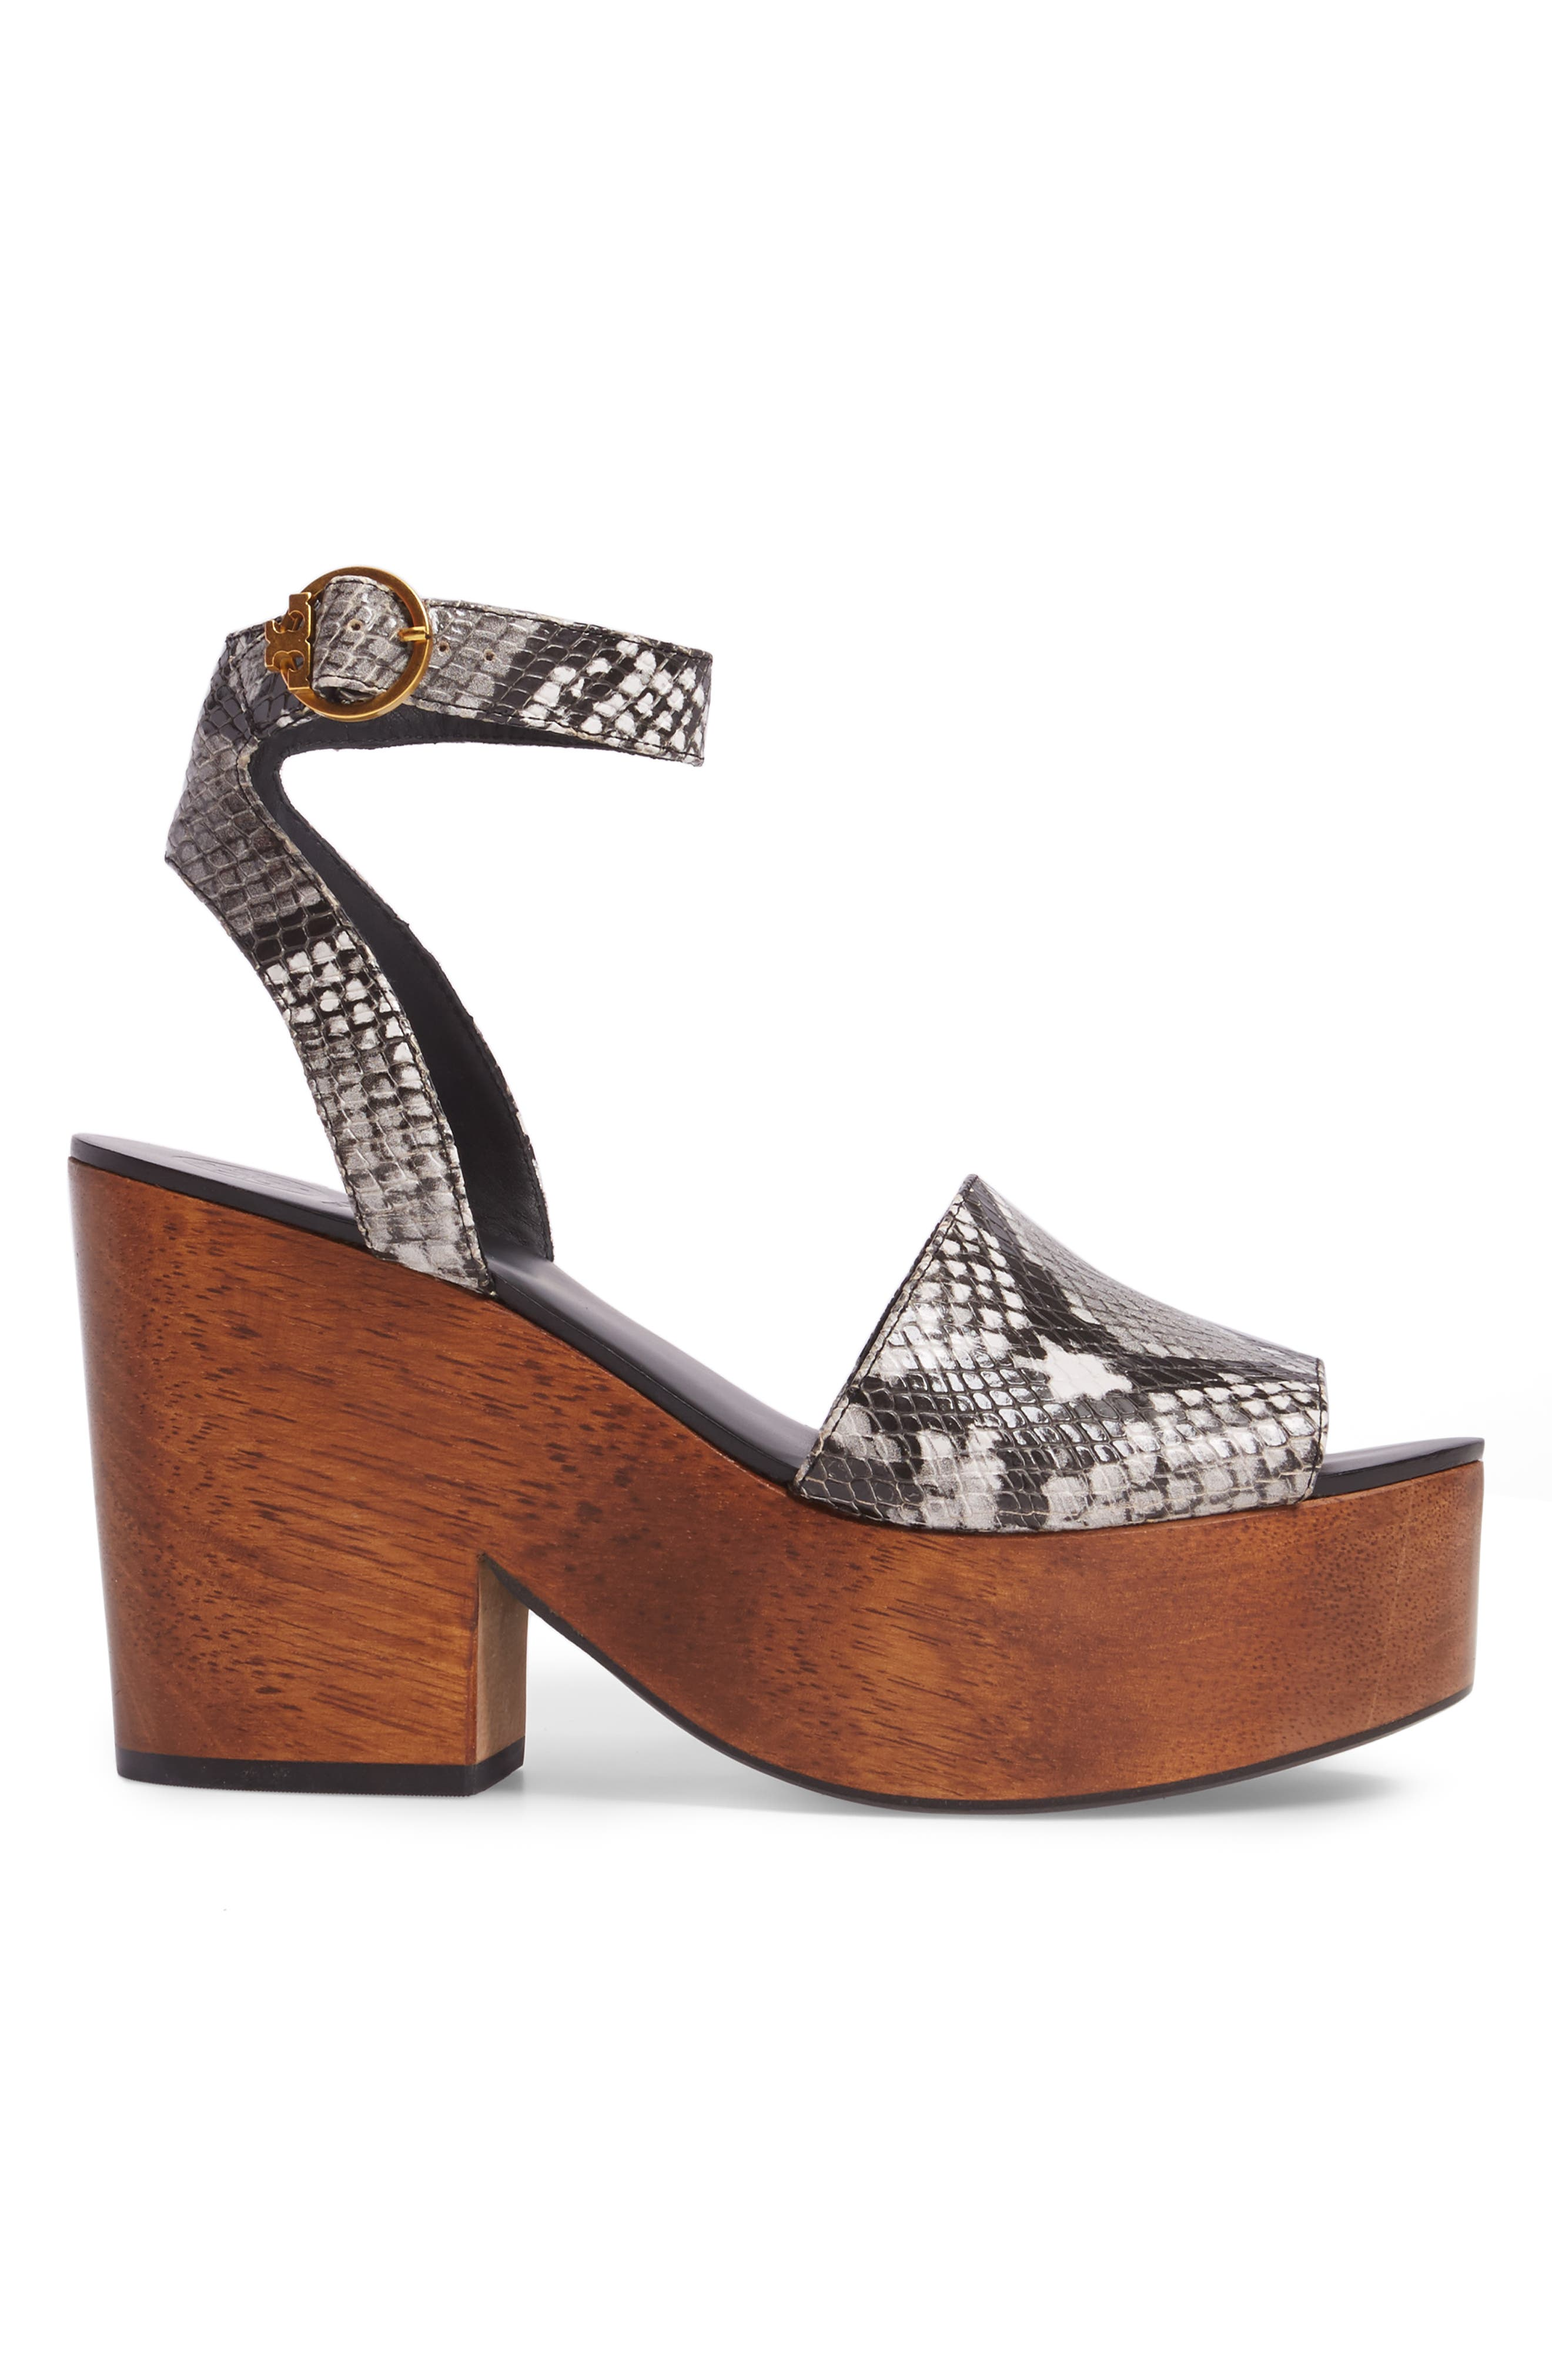 Camilla Platform Sandal,                             Alternate thumbnail 3, color,                             Roccia Black/ White